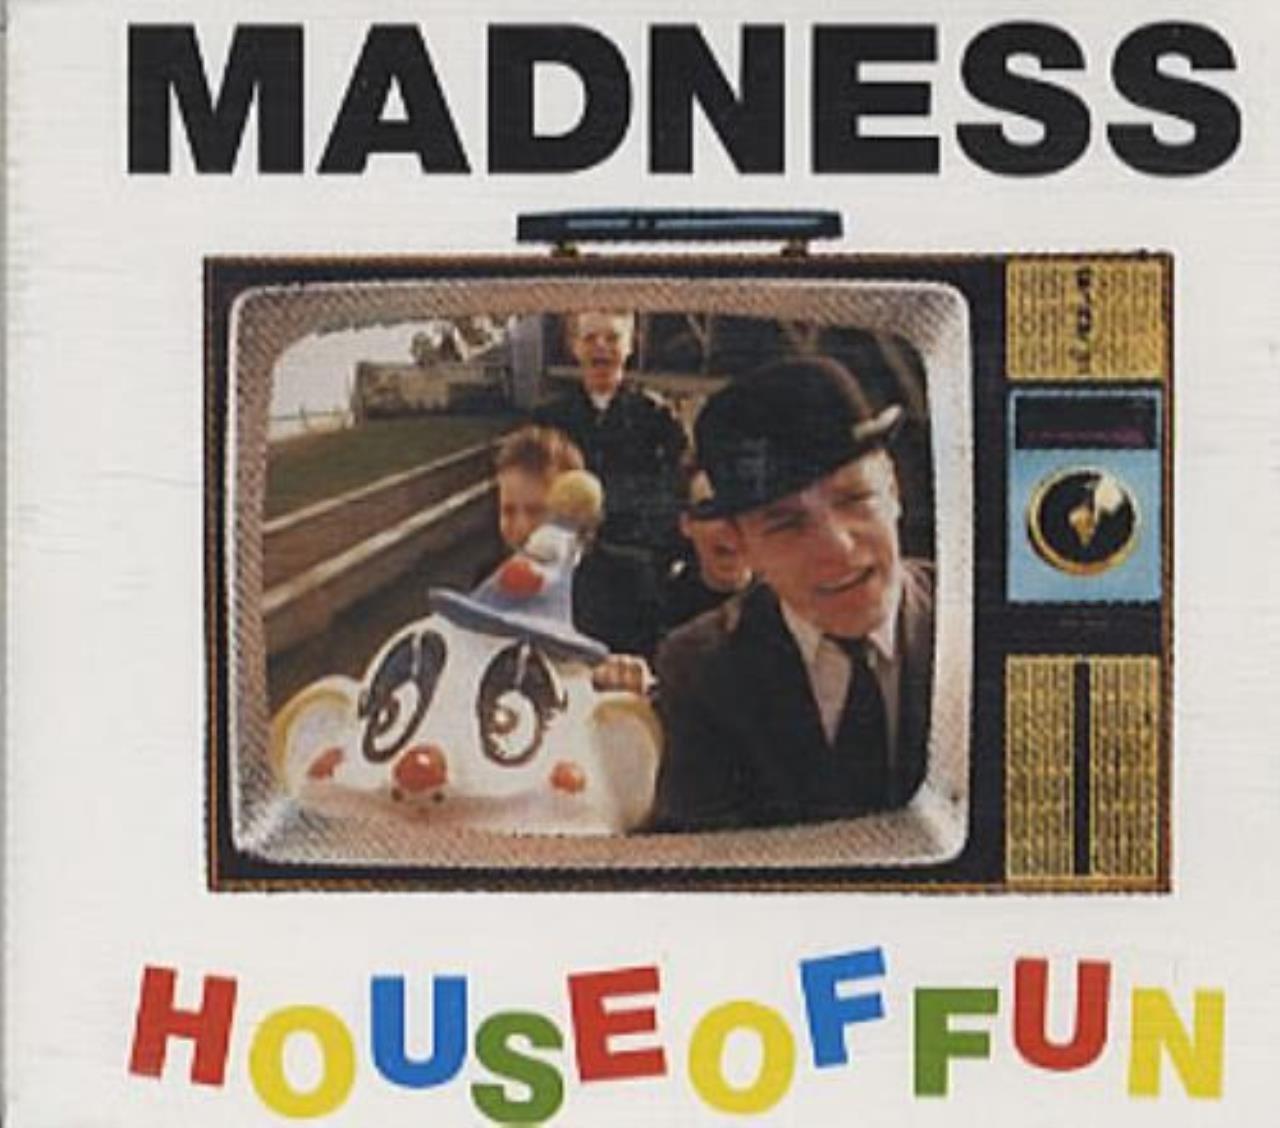 House Of Fun [CD-Single, Picture-CD, EU, Virgin 665 326 / VSCDT 1413]